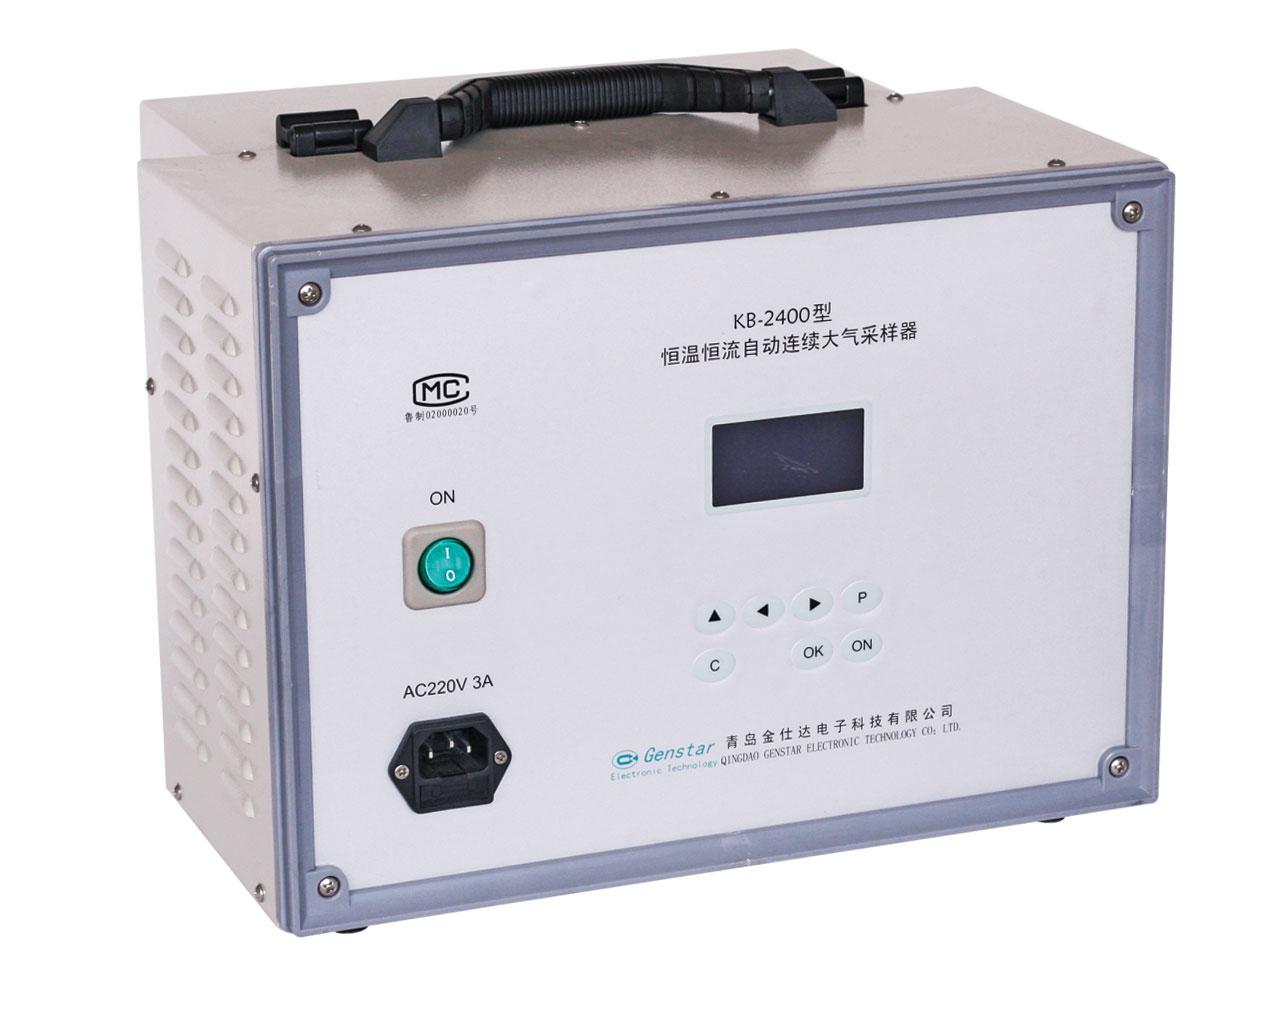 KB-2400(B)型恒温恒流自动连续大气采样器